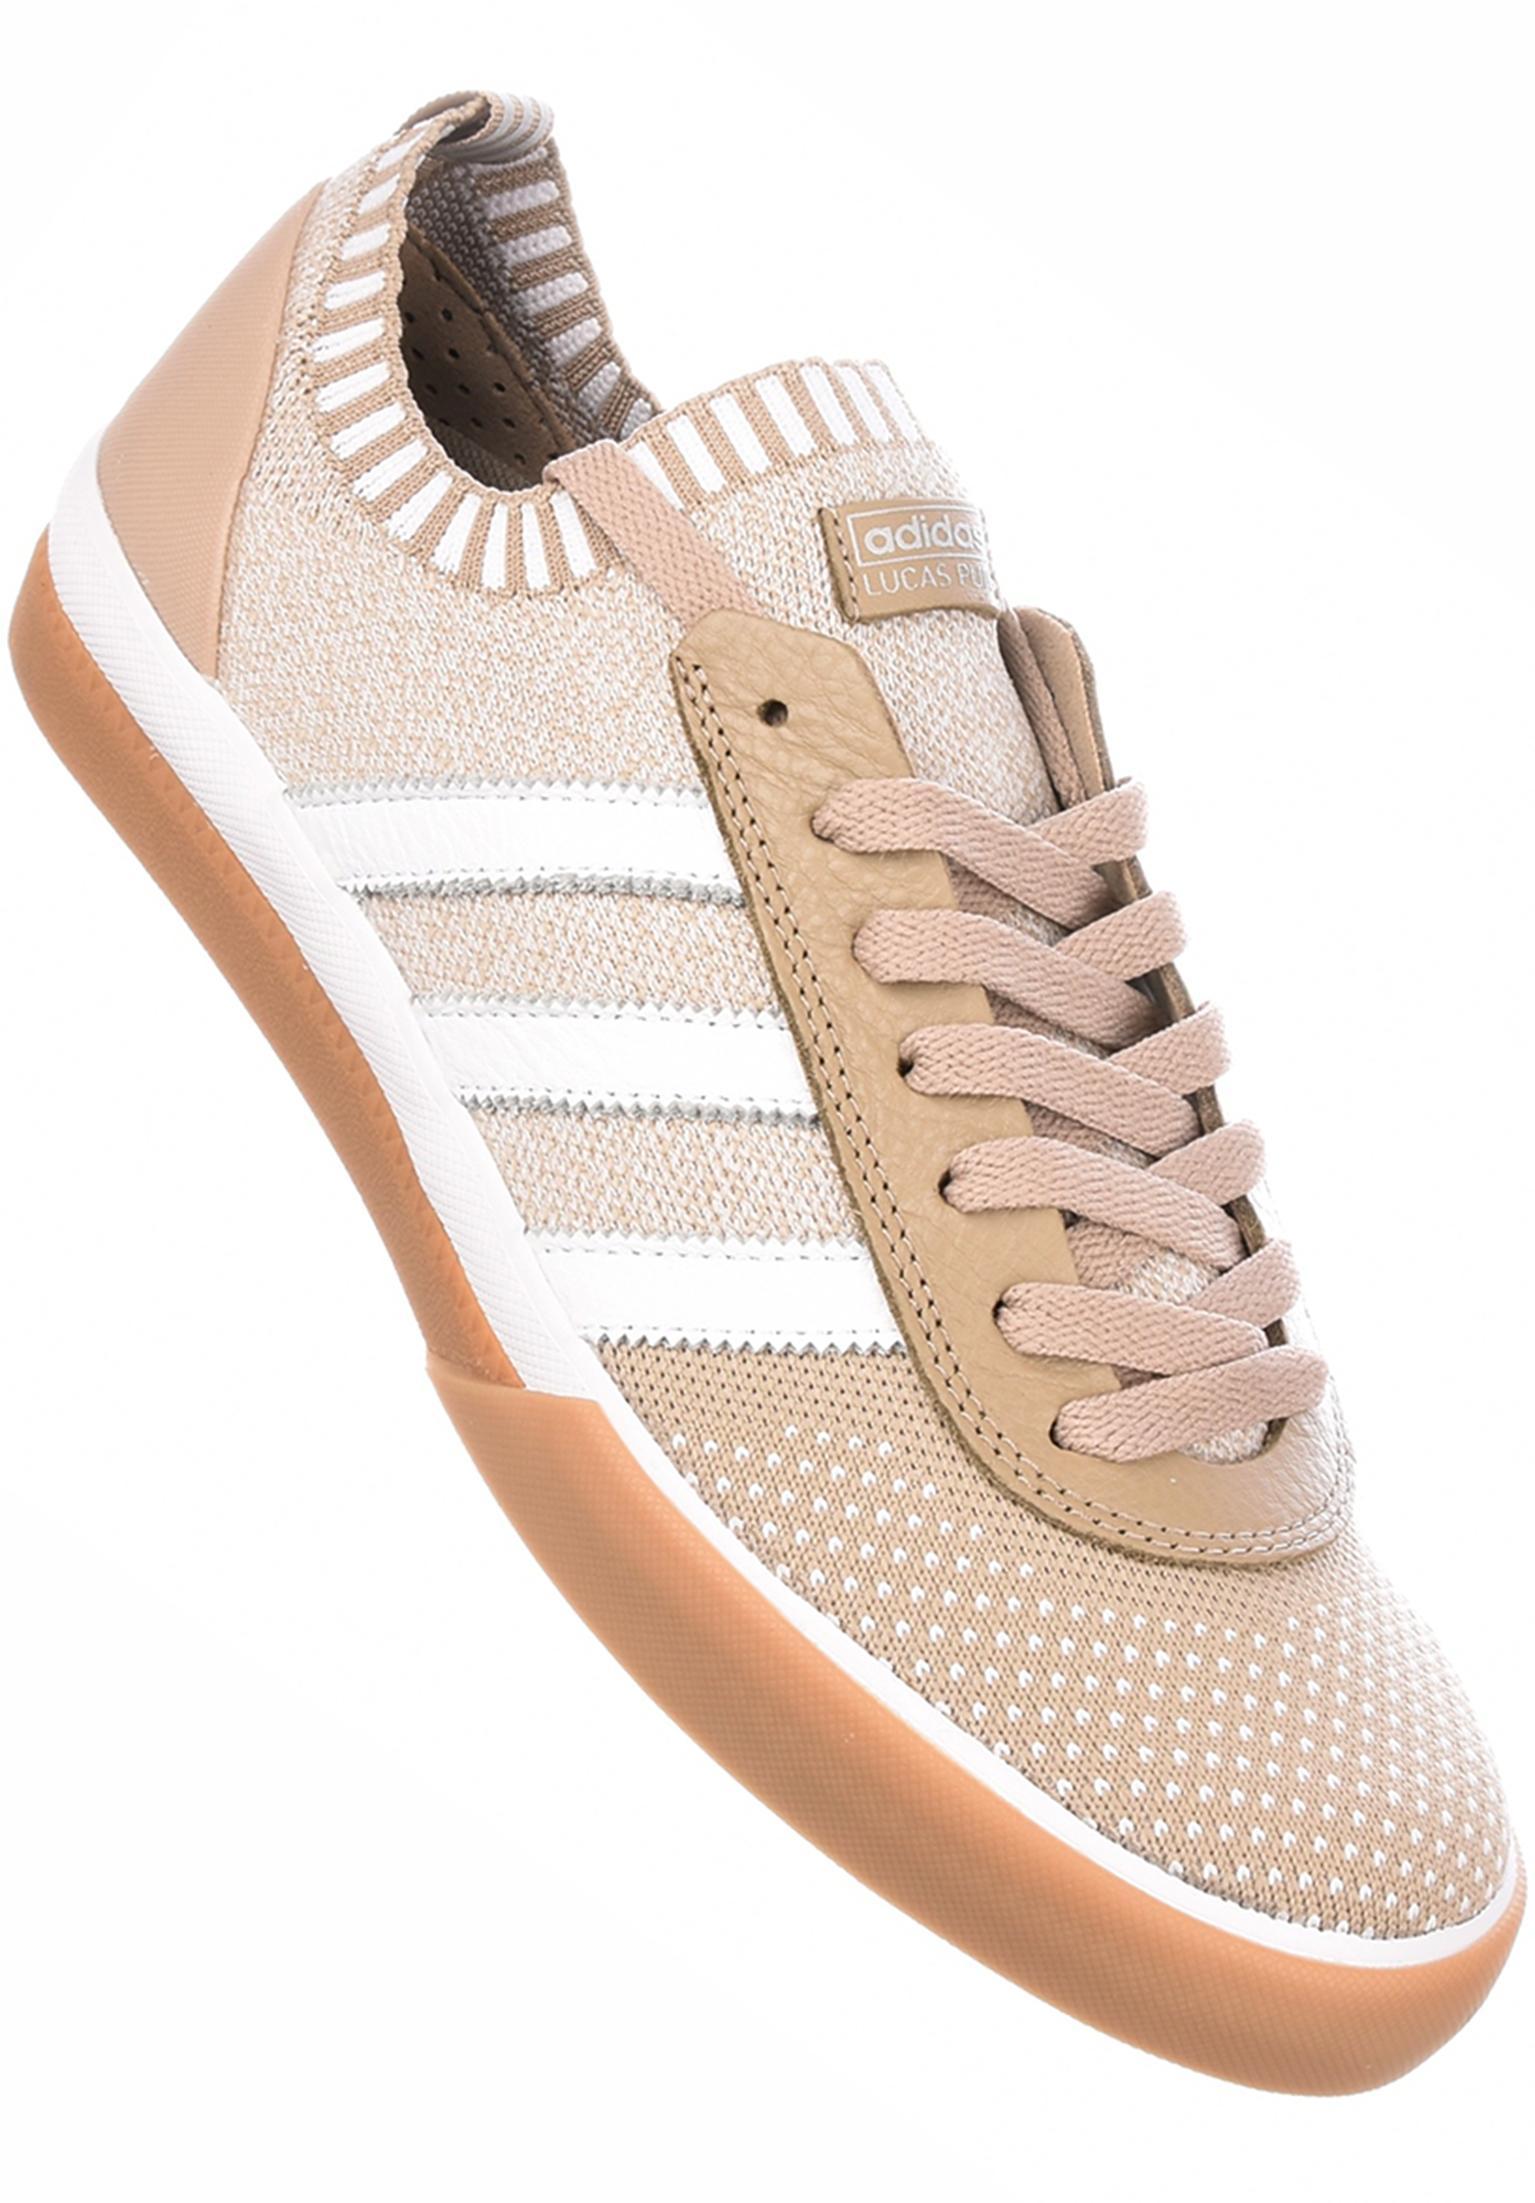 Lucas Premiere Primeknit adidas-skateboarding All Shoes in khaki for Men  d71eb9295